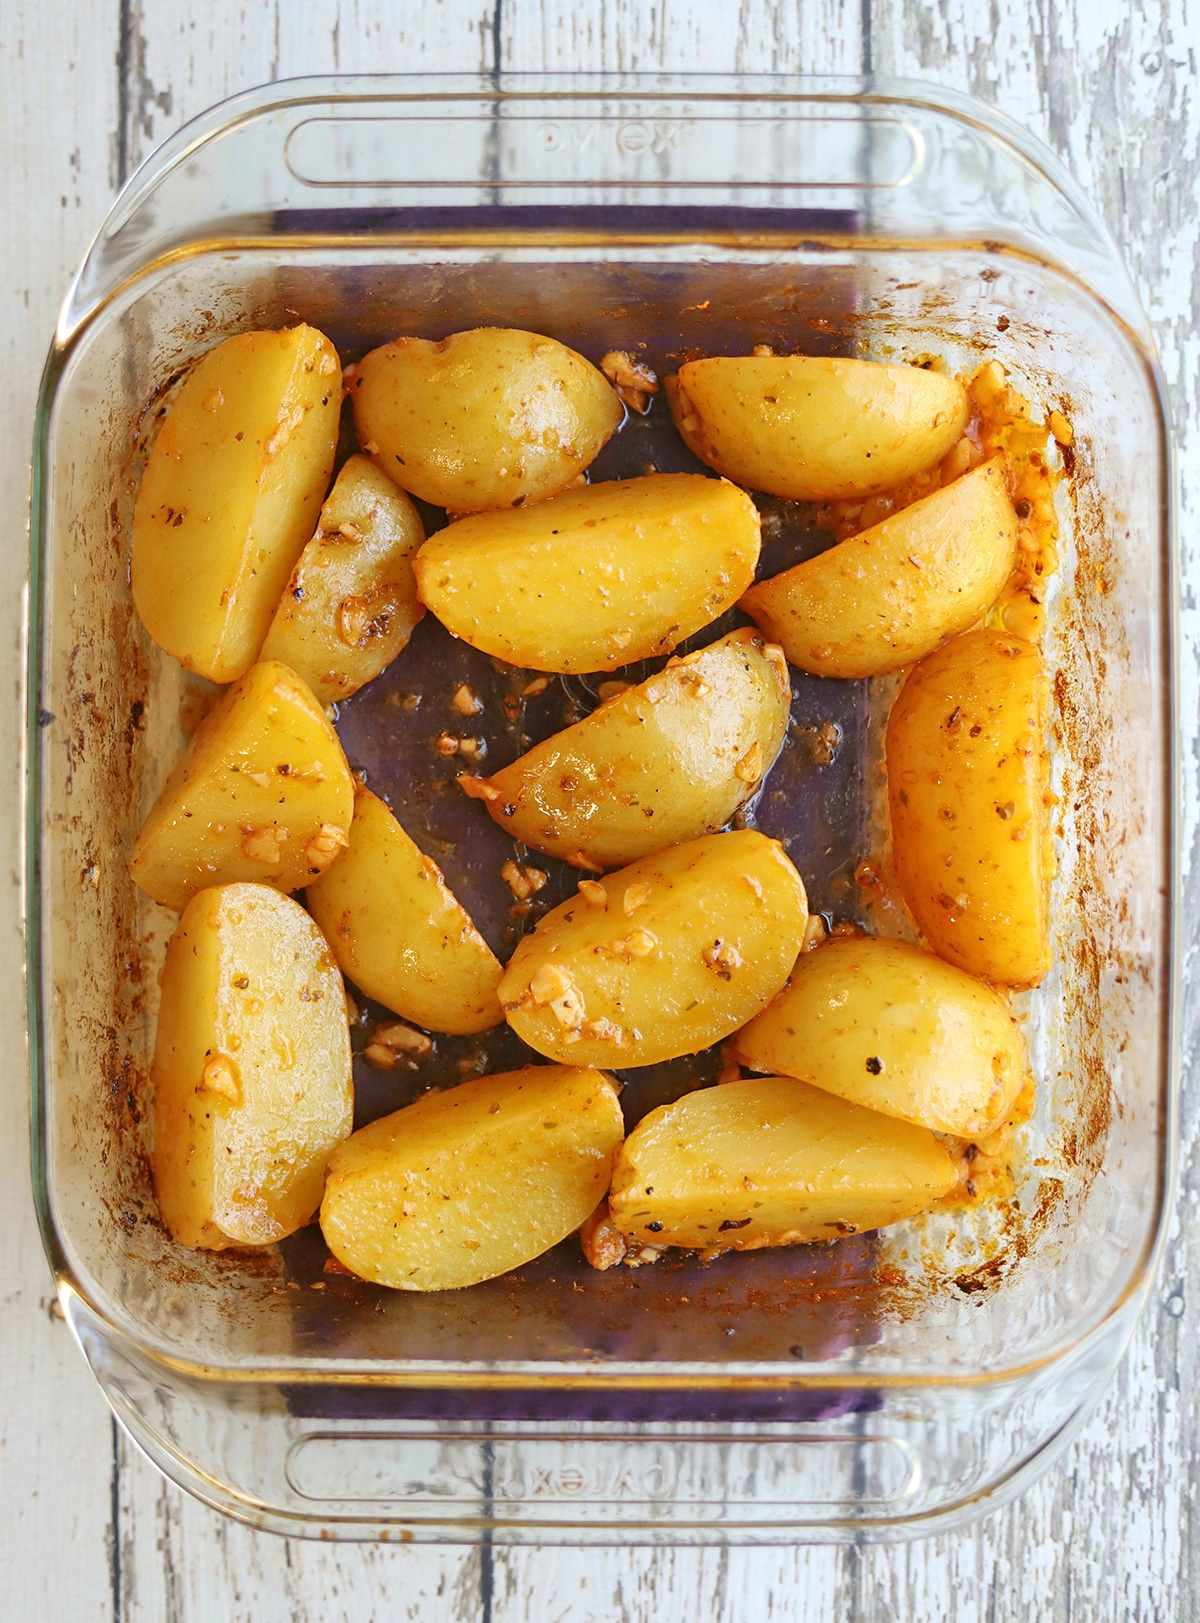 Roasted Yukon Golds in baking dish.